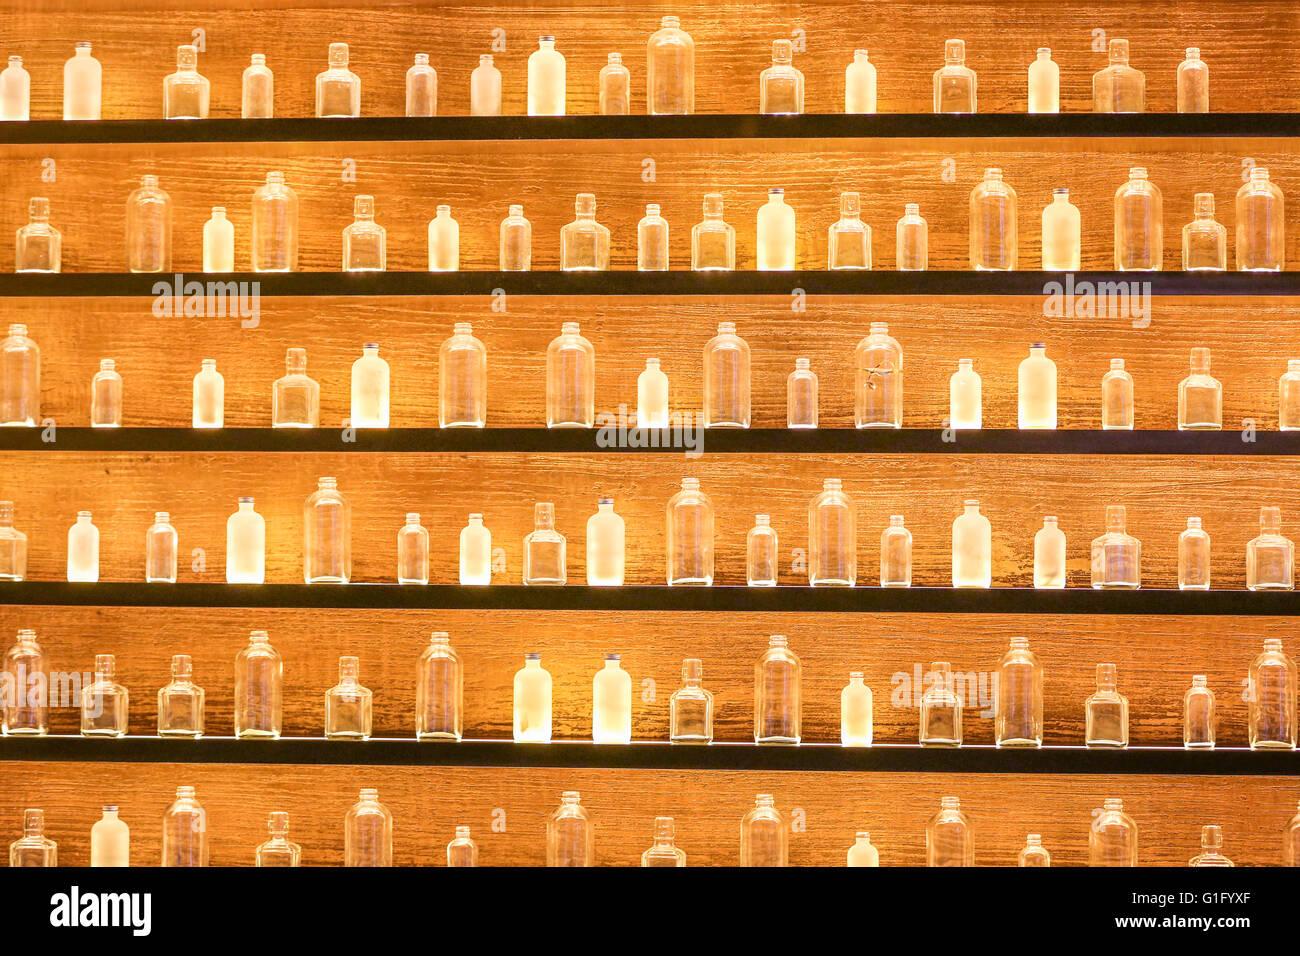 empty bottles of various sizes on shelves lite with light Stock Photo